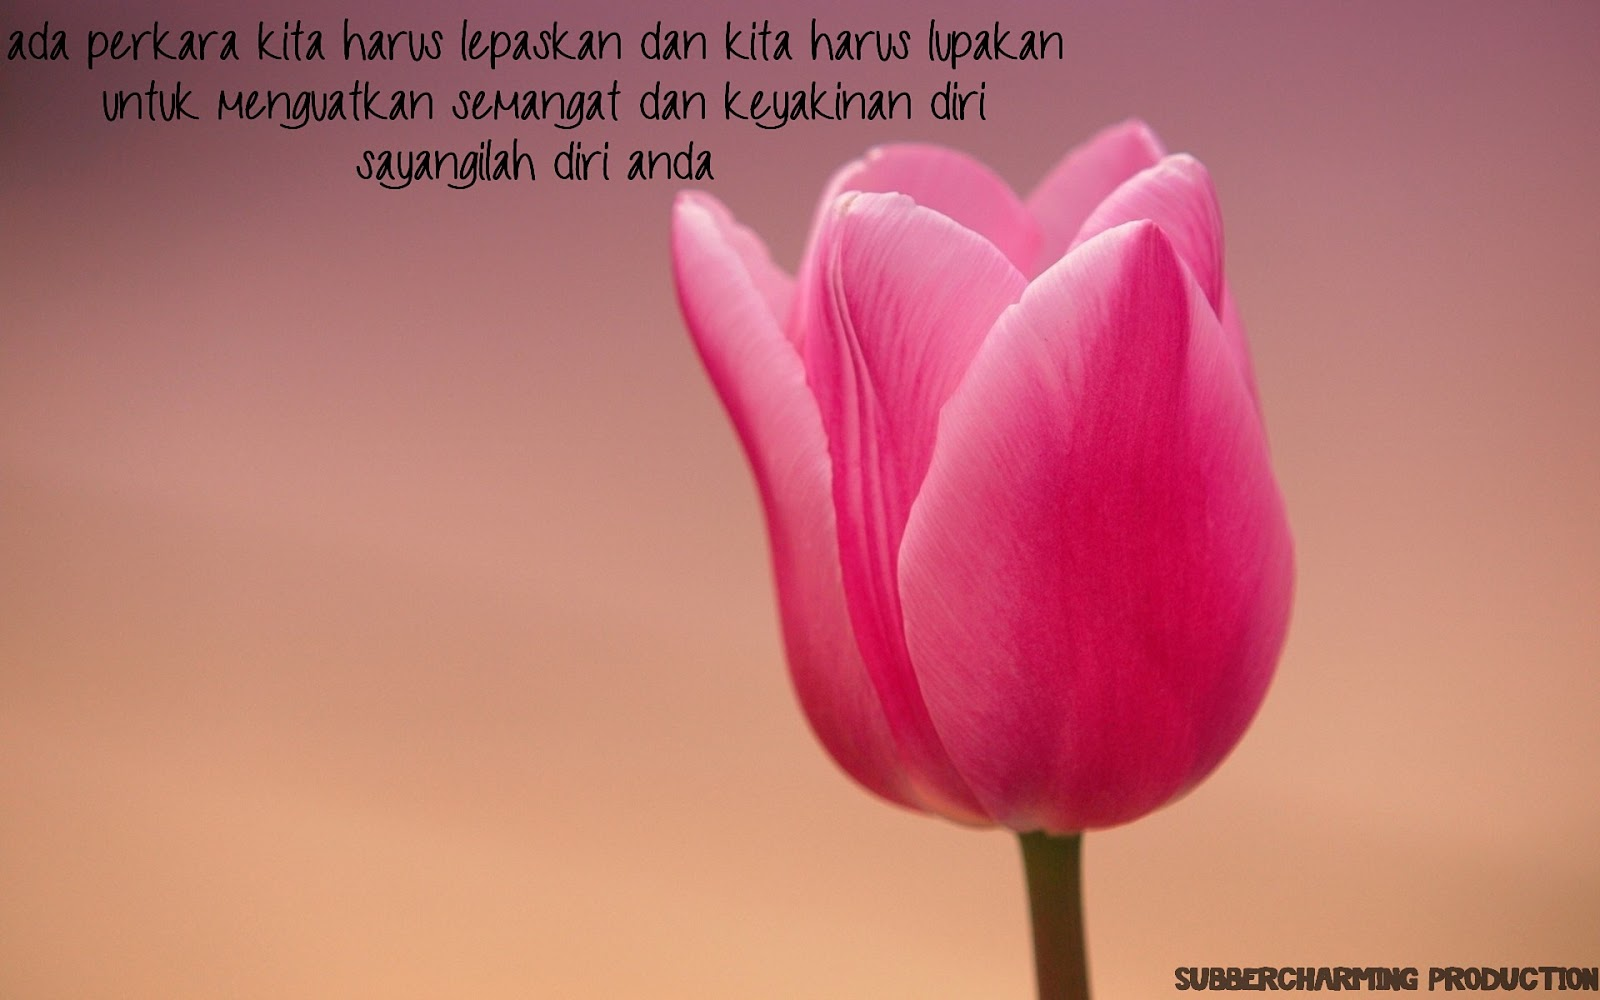 http://1.bp.blogspot.com/-Nw9412xNu74/UQ3HN3anFlI/AAAAAAAAAgw/9uCMrHbjOJ8/s1600/pink-tulip-wallpaper-1920x1200.jpg